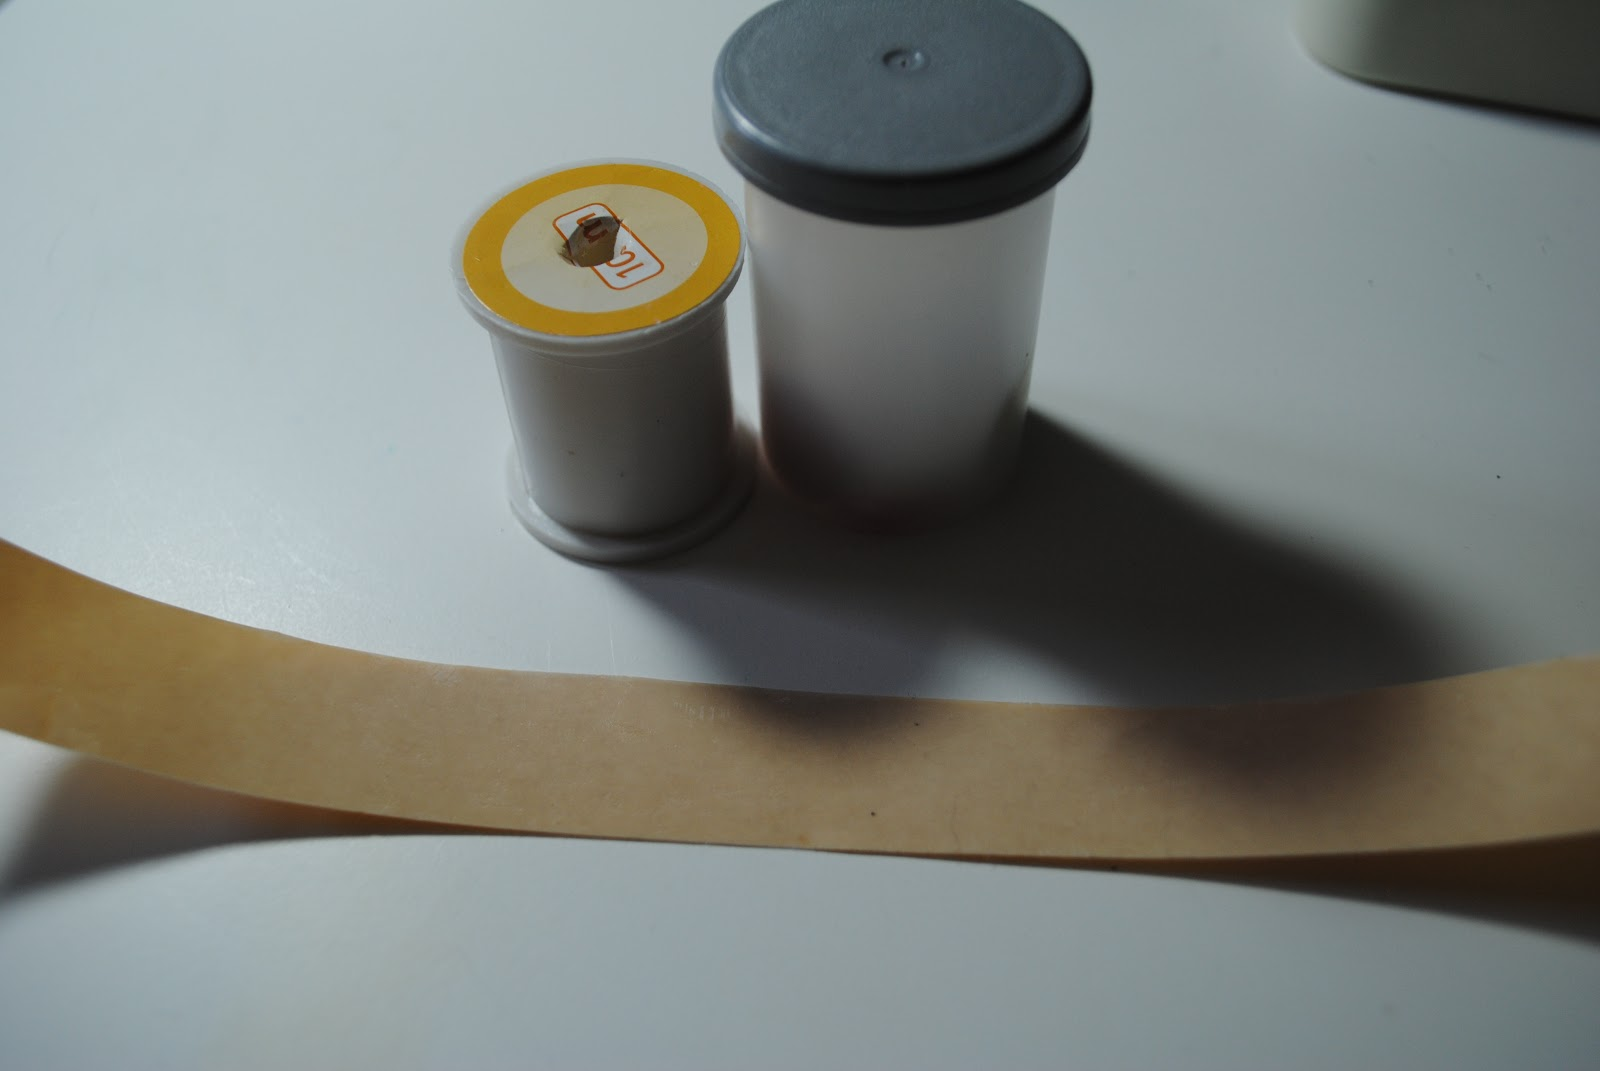 valeomi upcycling dienstag. Black Bedroom Furniture Sets. Home Design Ideas